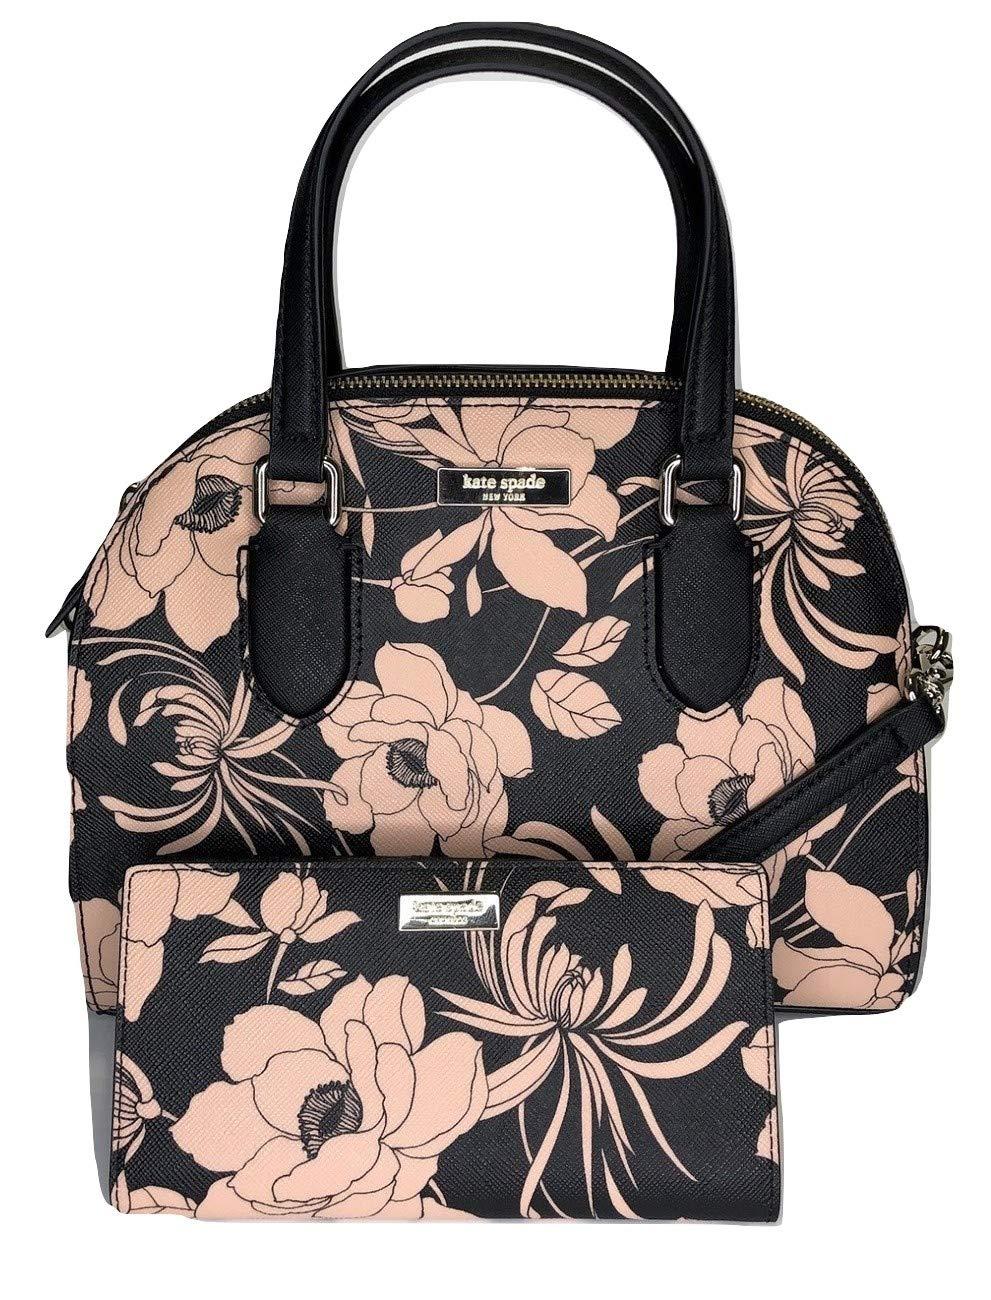 Kate Spade New York Laurel Way Mini Reiley WKRU5639 bundled with matching Stacy Wallet (Black/Flowers)